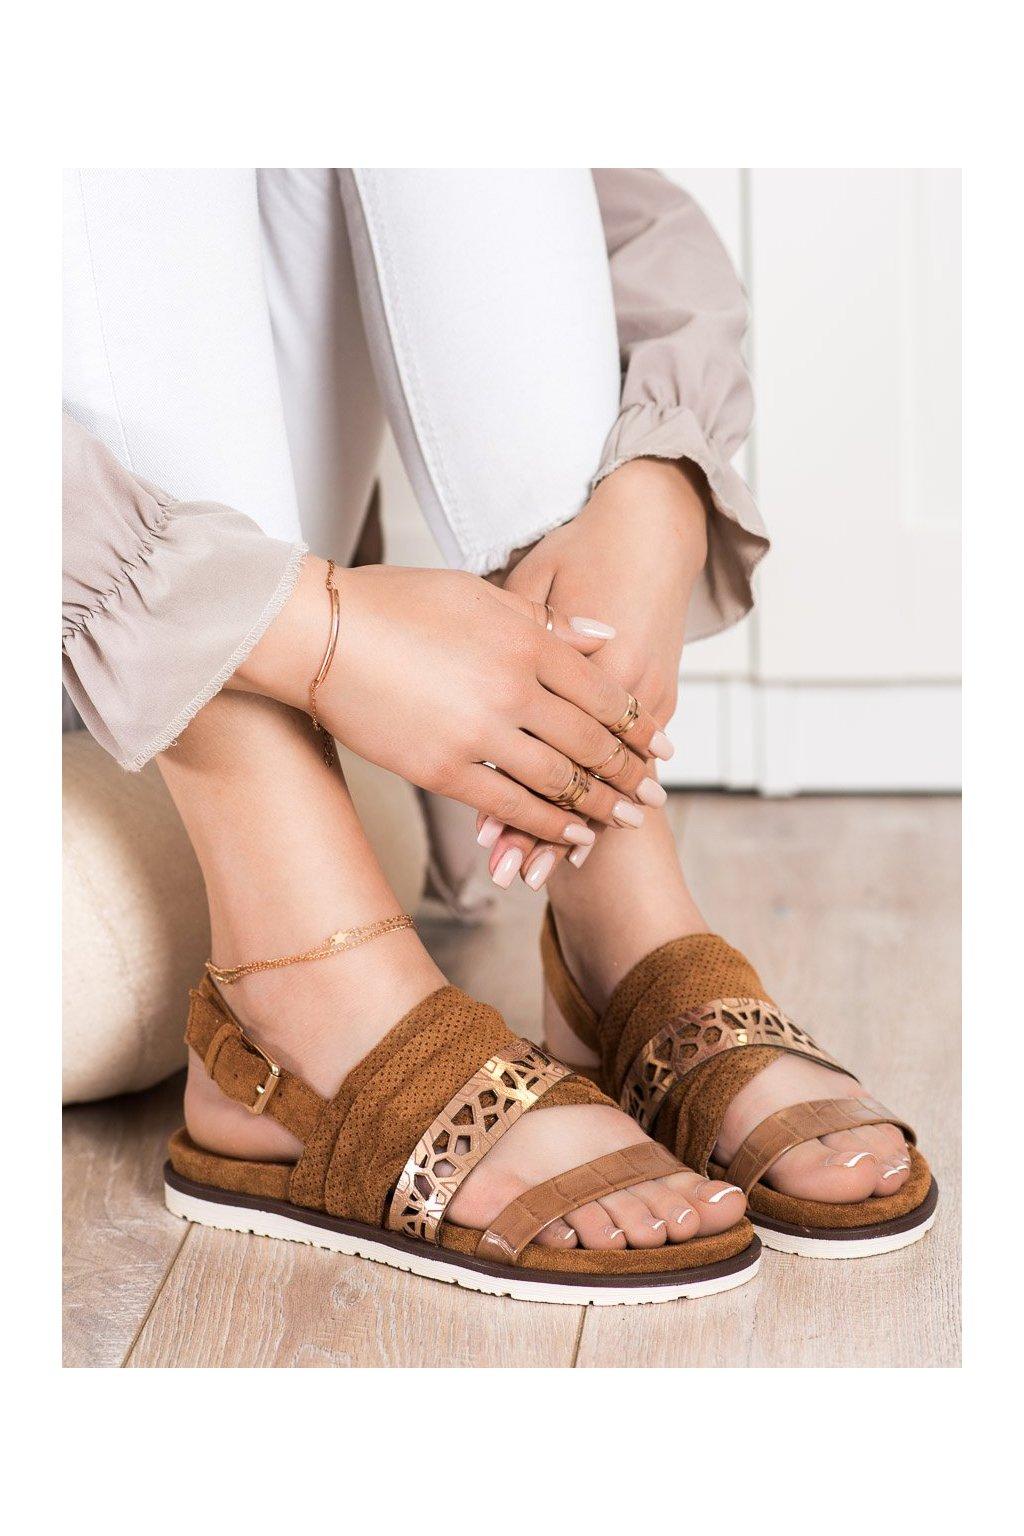 Hnedé sandále Evento kod 21SD35-3570C